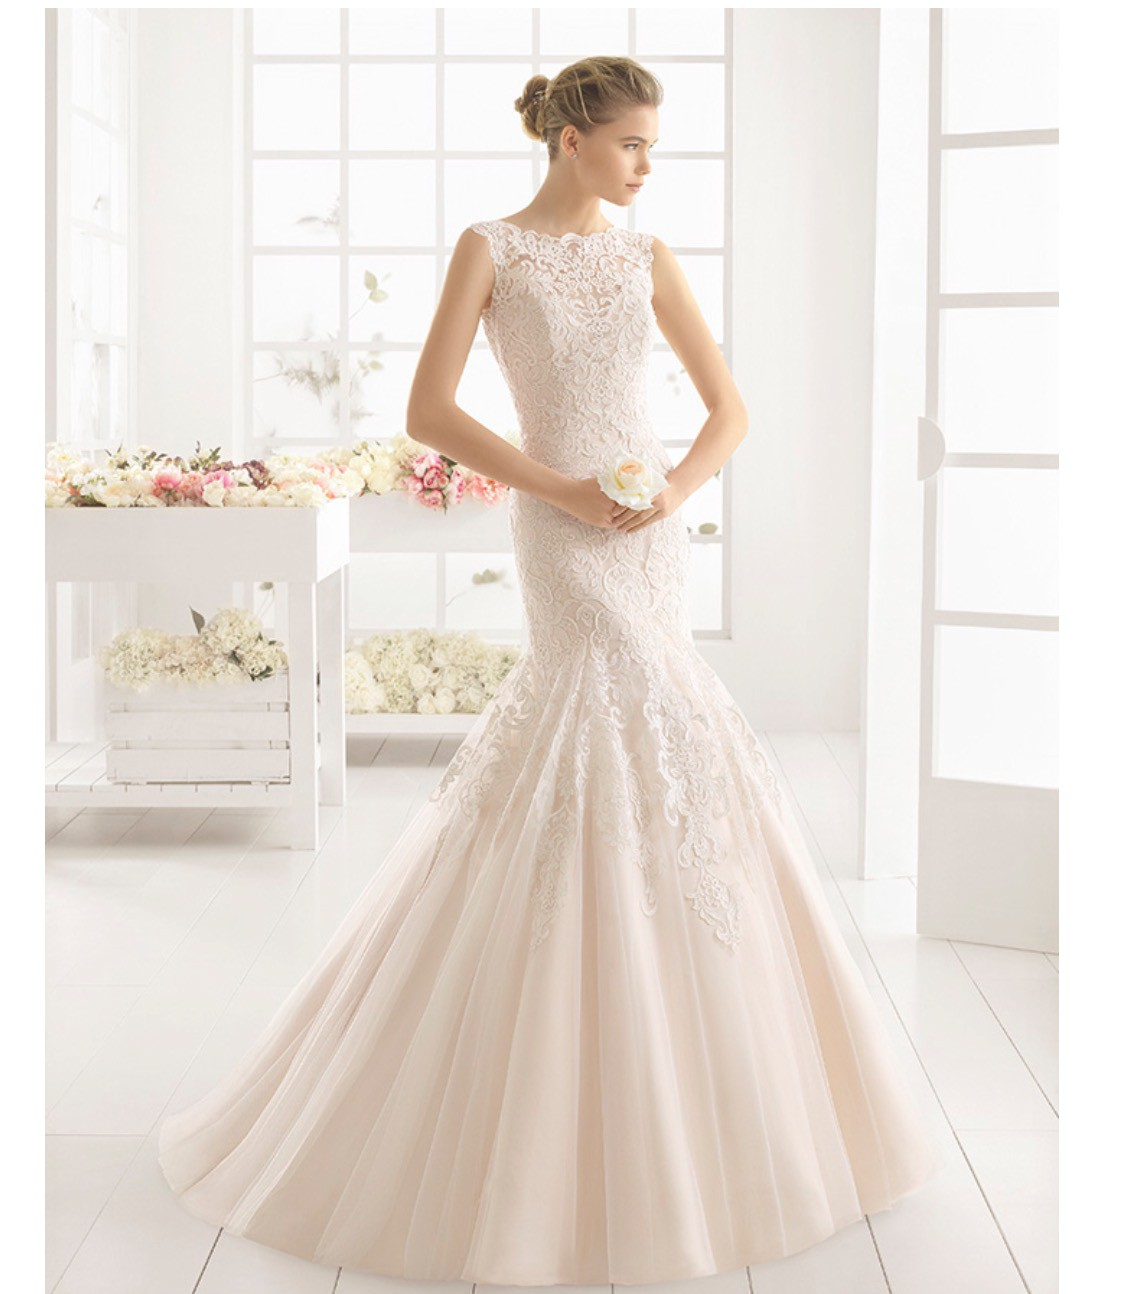 d4aaf7b67b Rosa Clara Matilde Second Hand Wedding Dress on Sale 66% Off ...